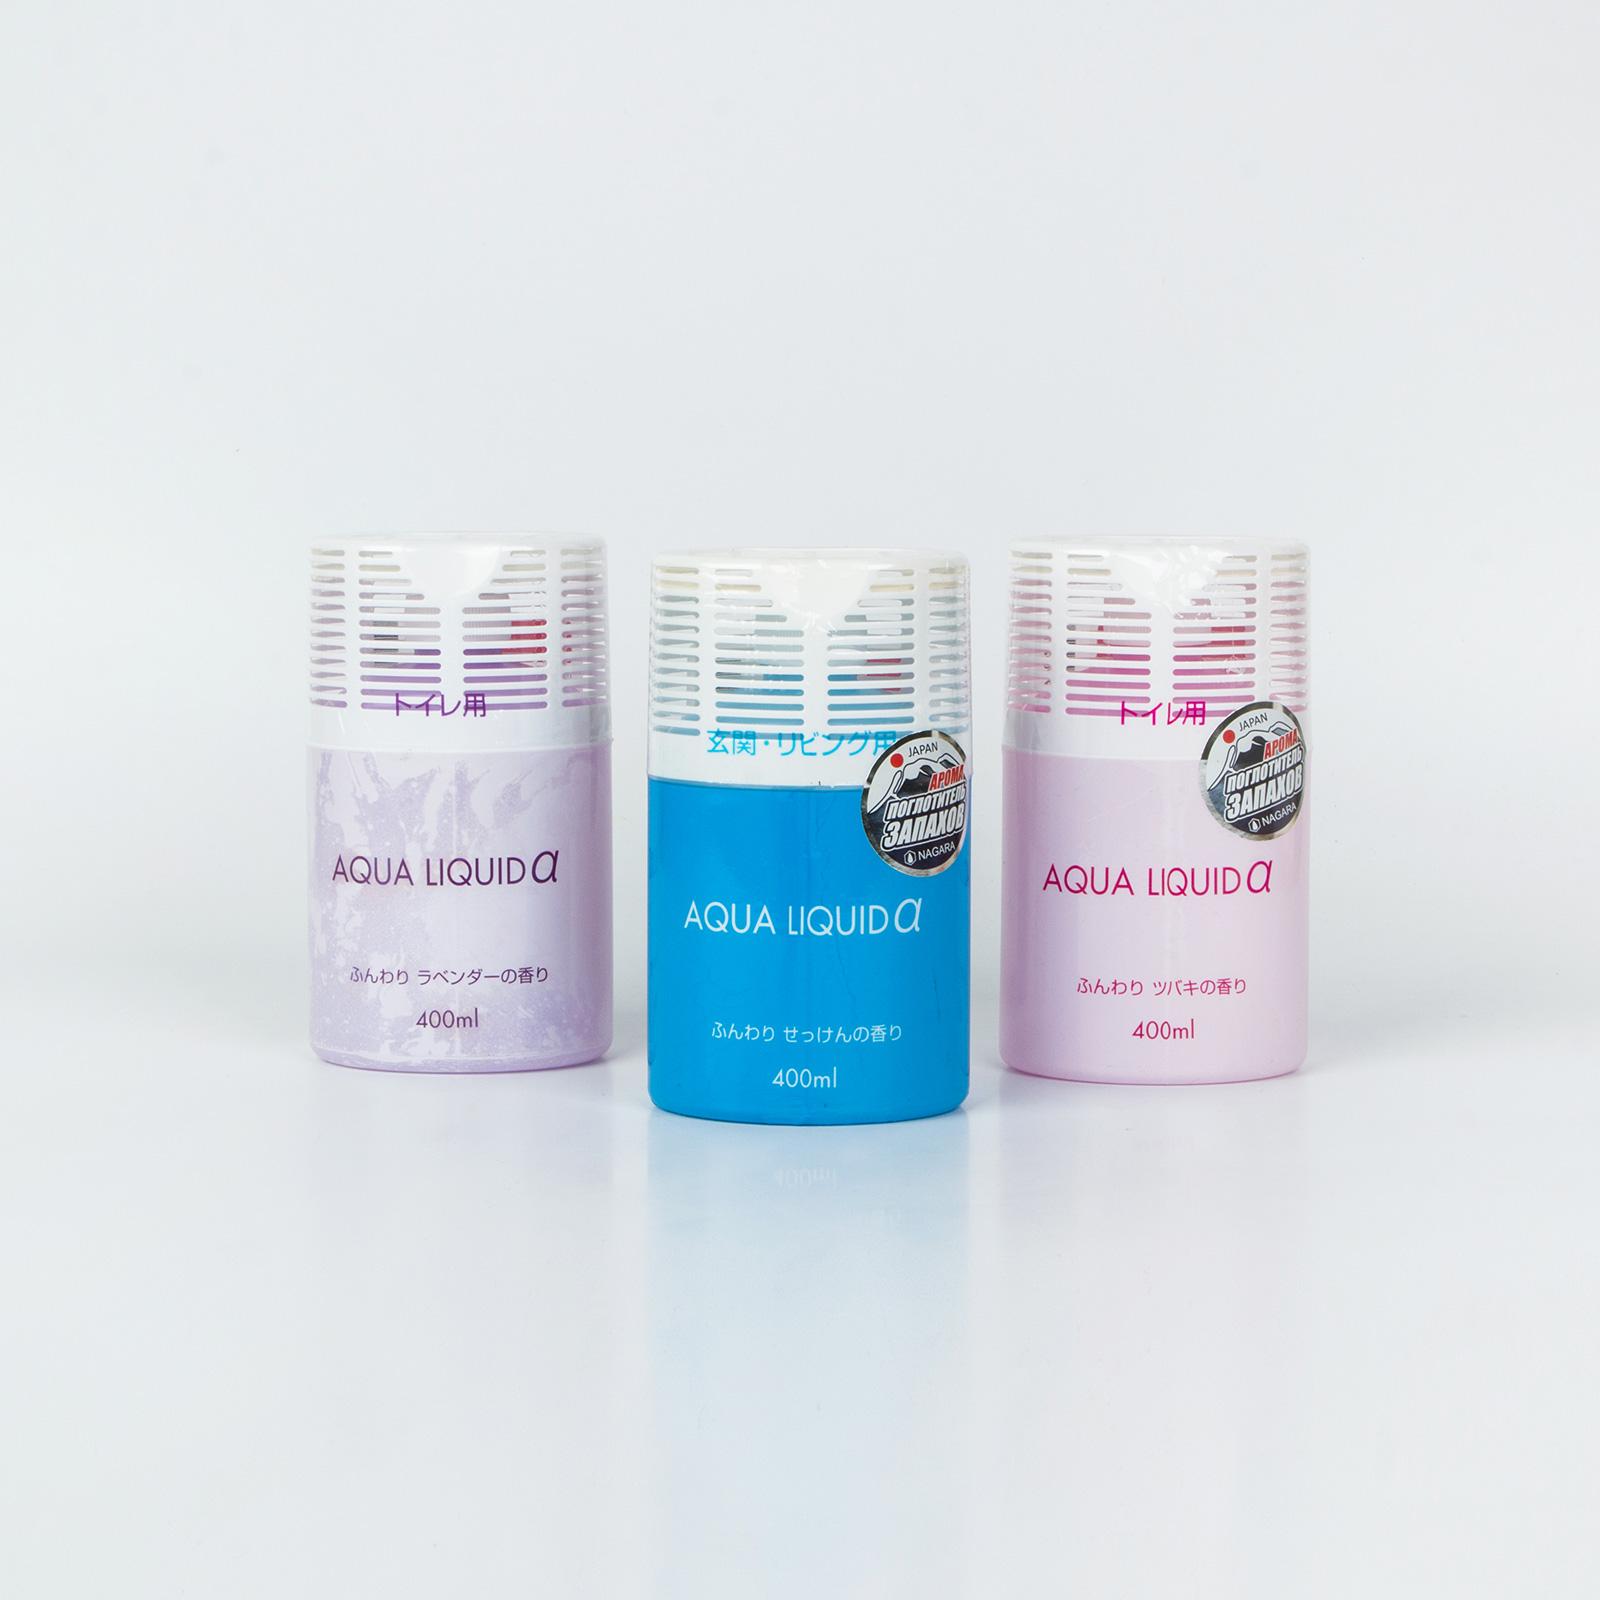 Набор арома-поглотителей запахов для туалета «Nagara» Камелия+Лаванда+Мыло nagara средство для чистки туалета 5 шт